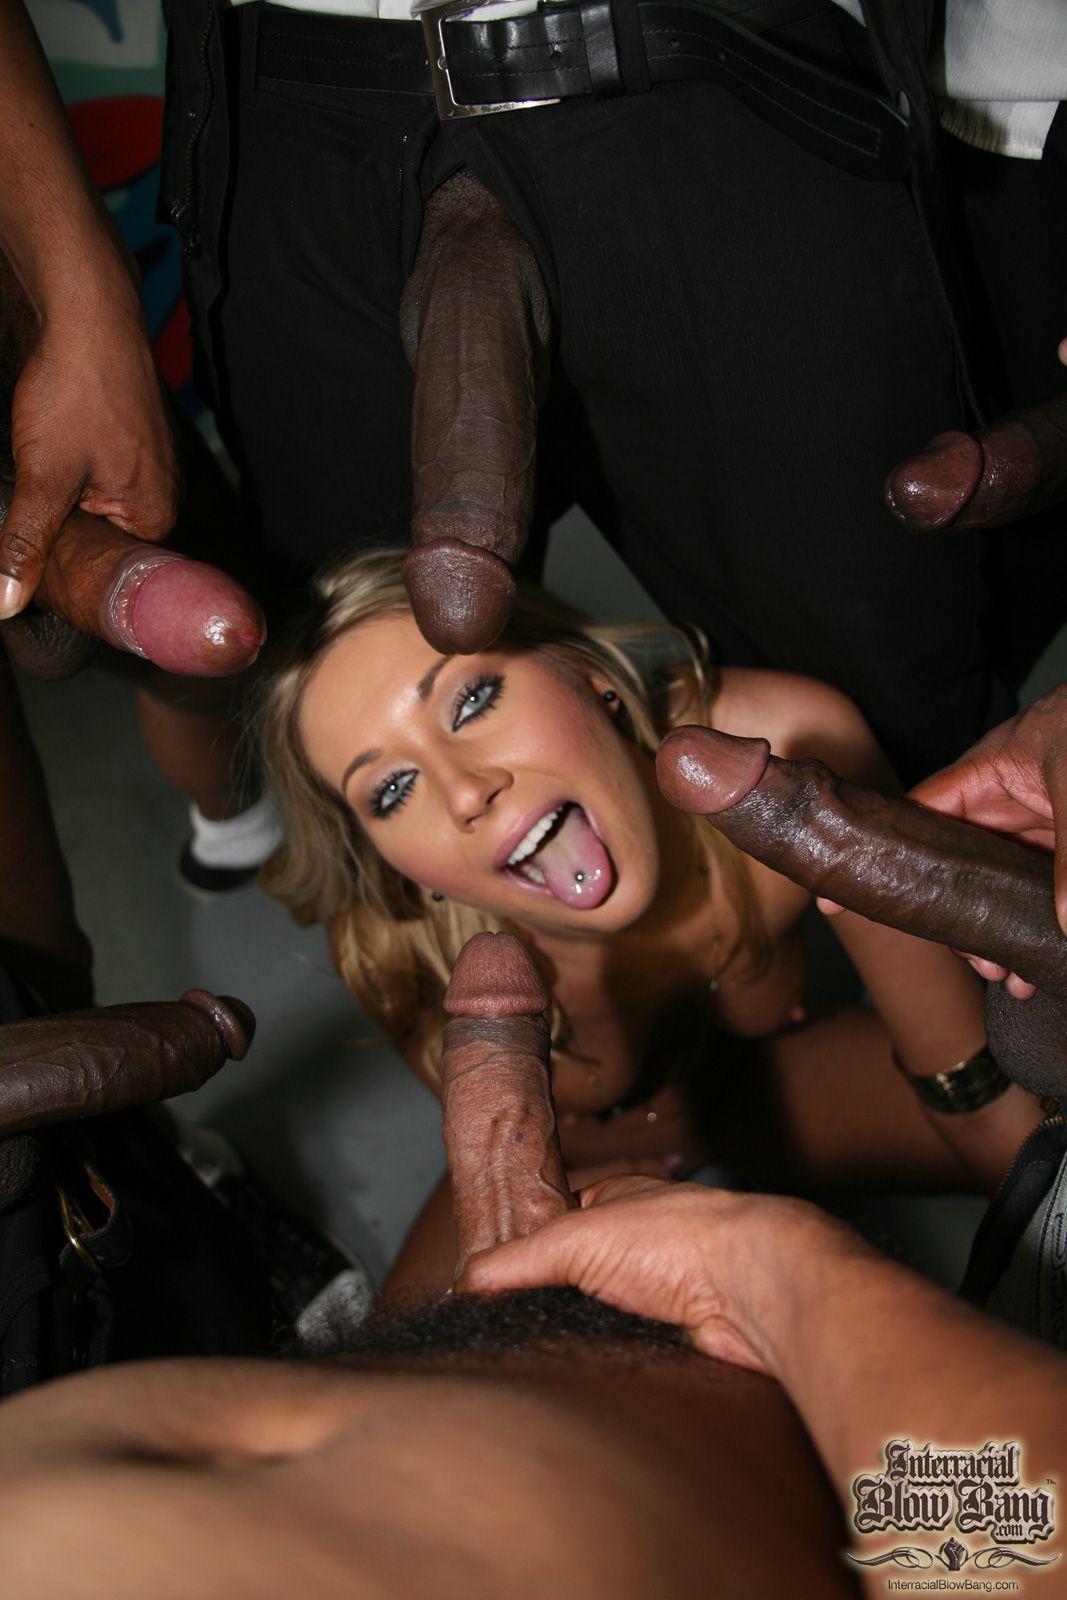 Porn Bbc Handjob Tumblr handjob - porn archive